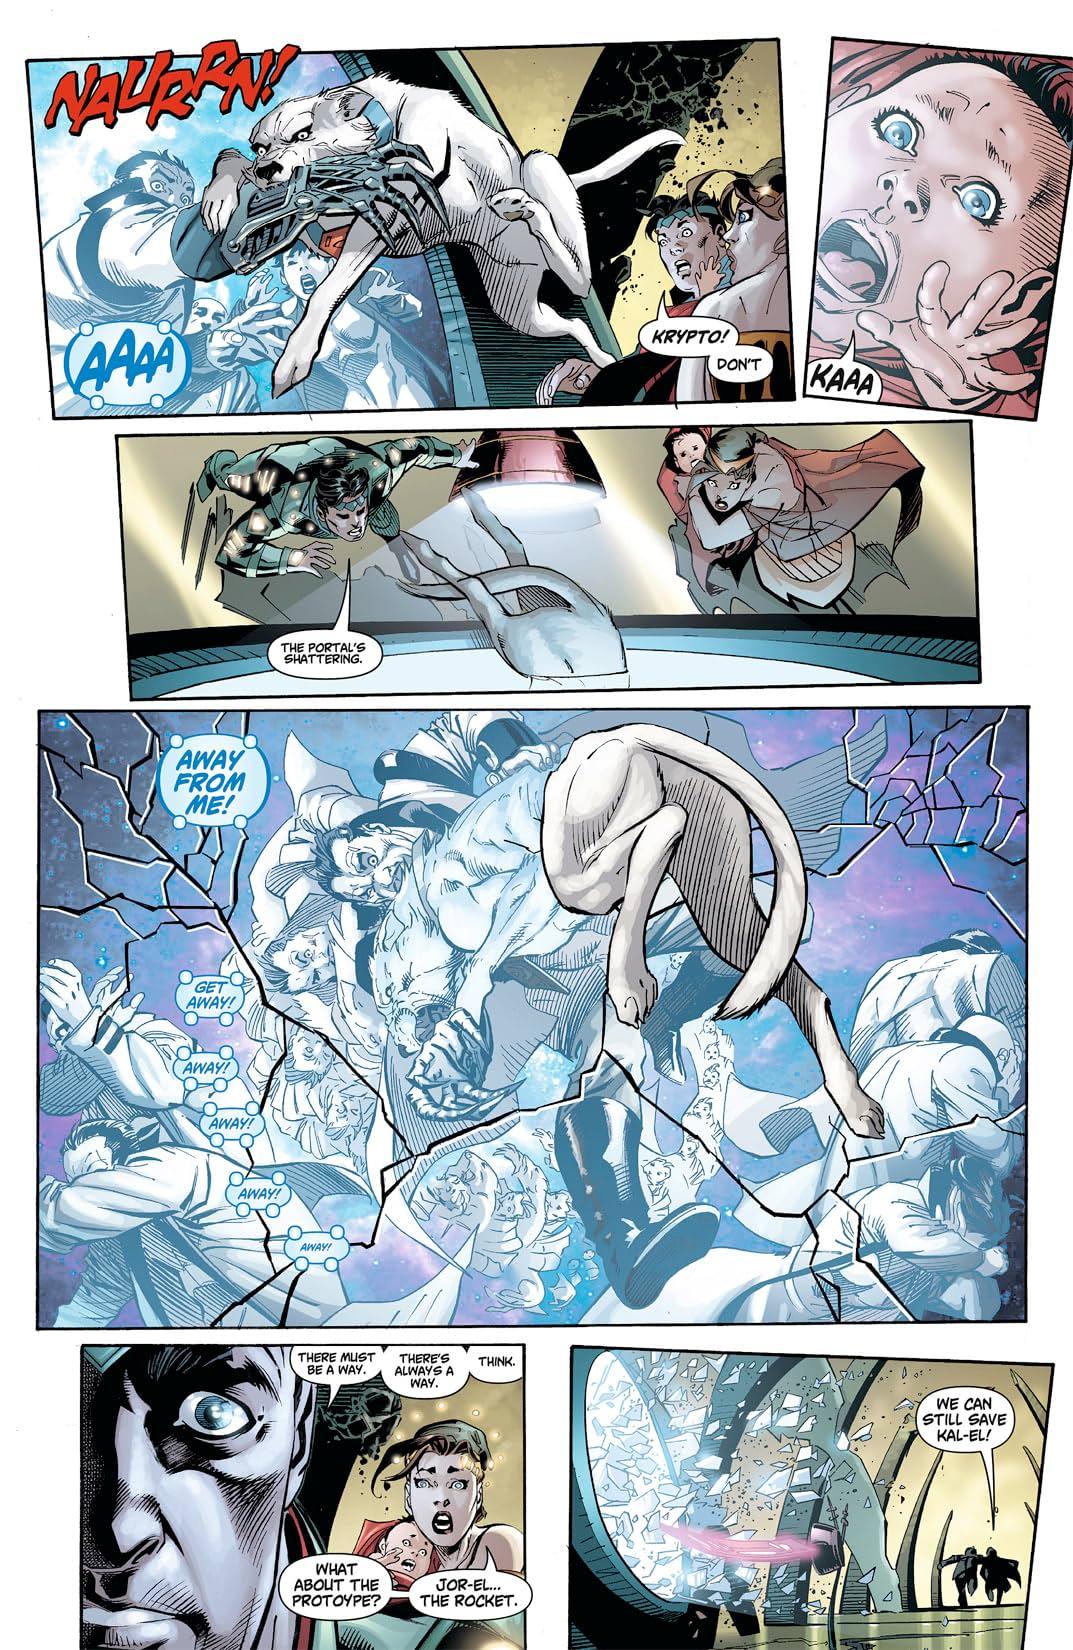 Action Comics (2011-) #5